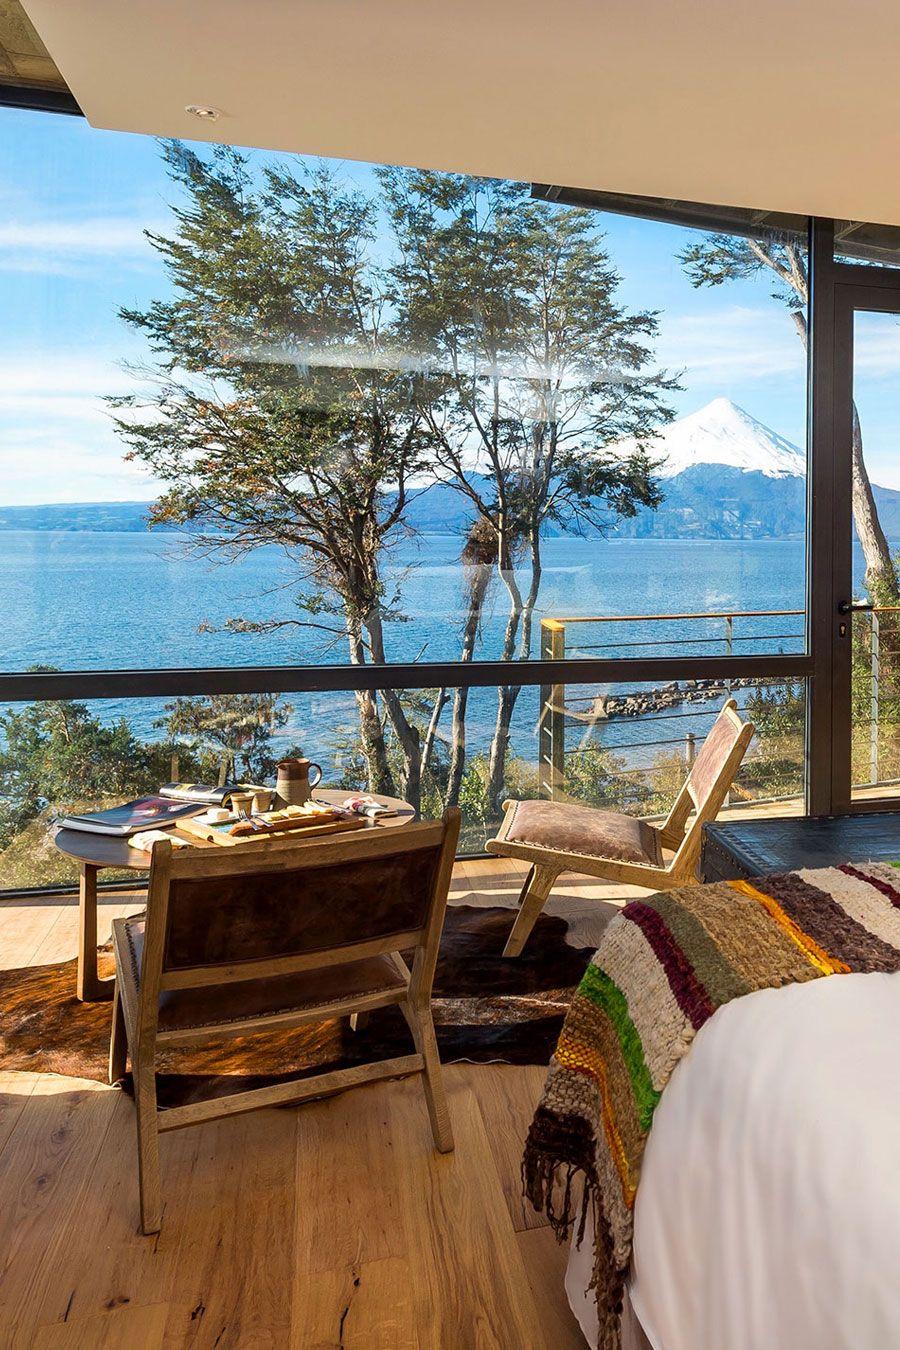 Hotel Awa Puerto Varas Chile Hotel Luxury Boutique Hotel Hotel Amenities